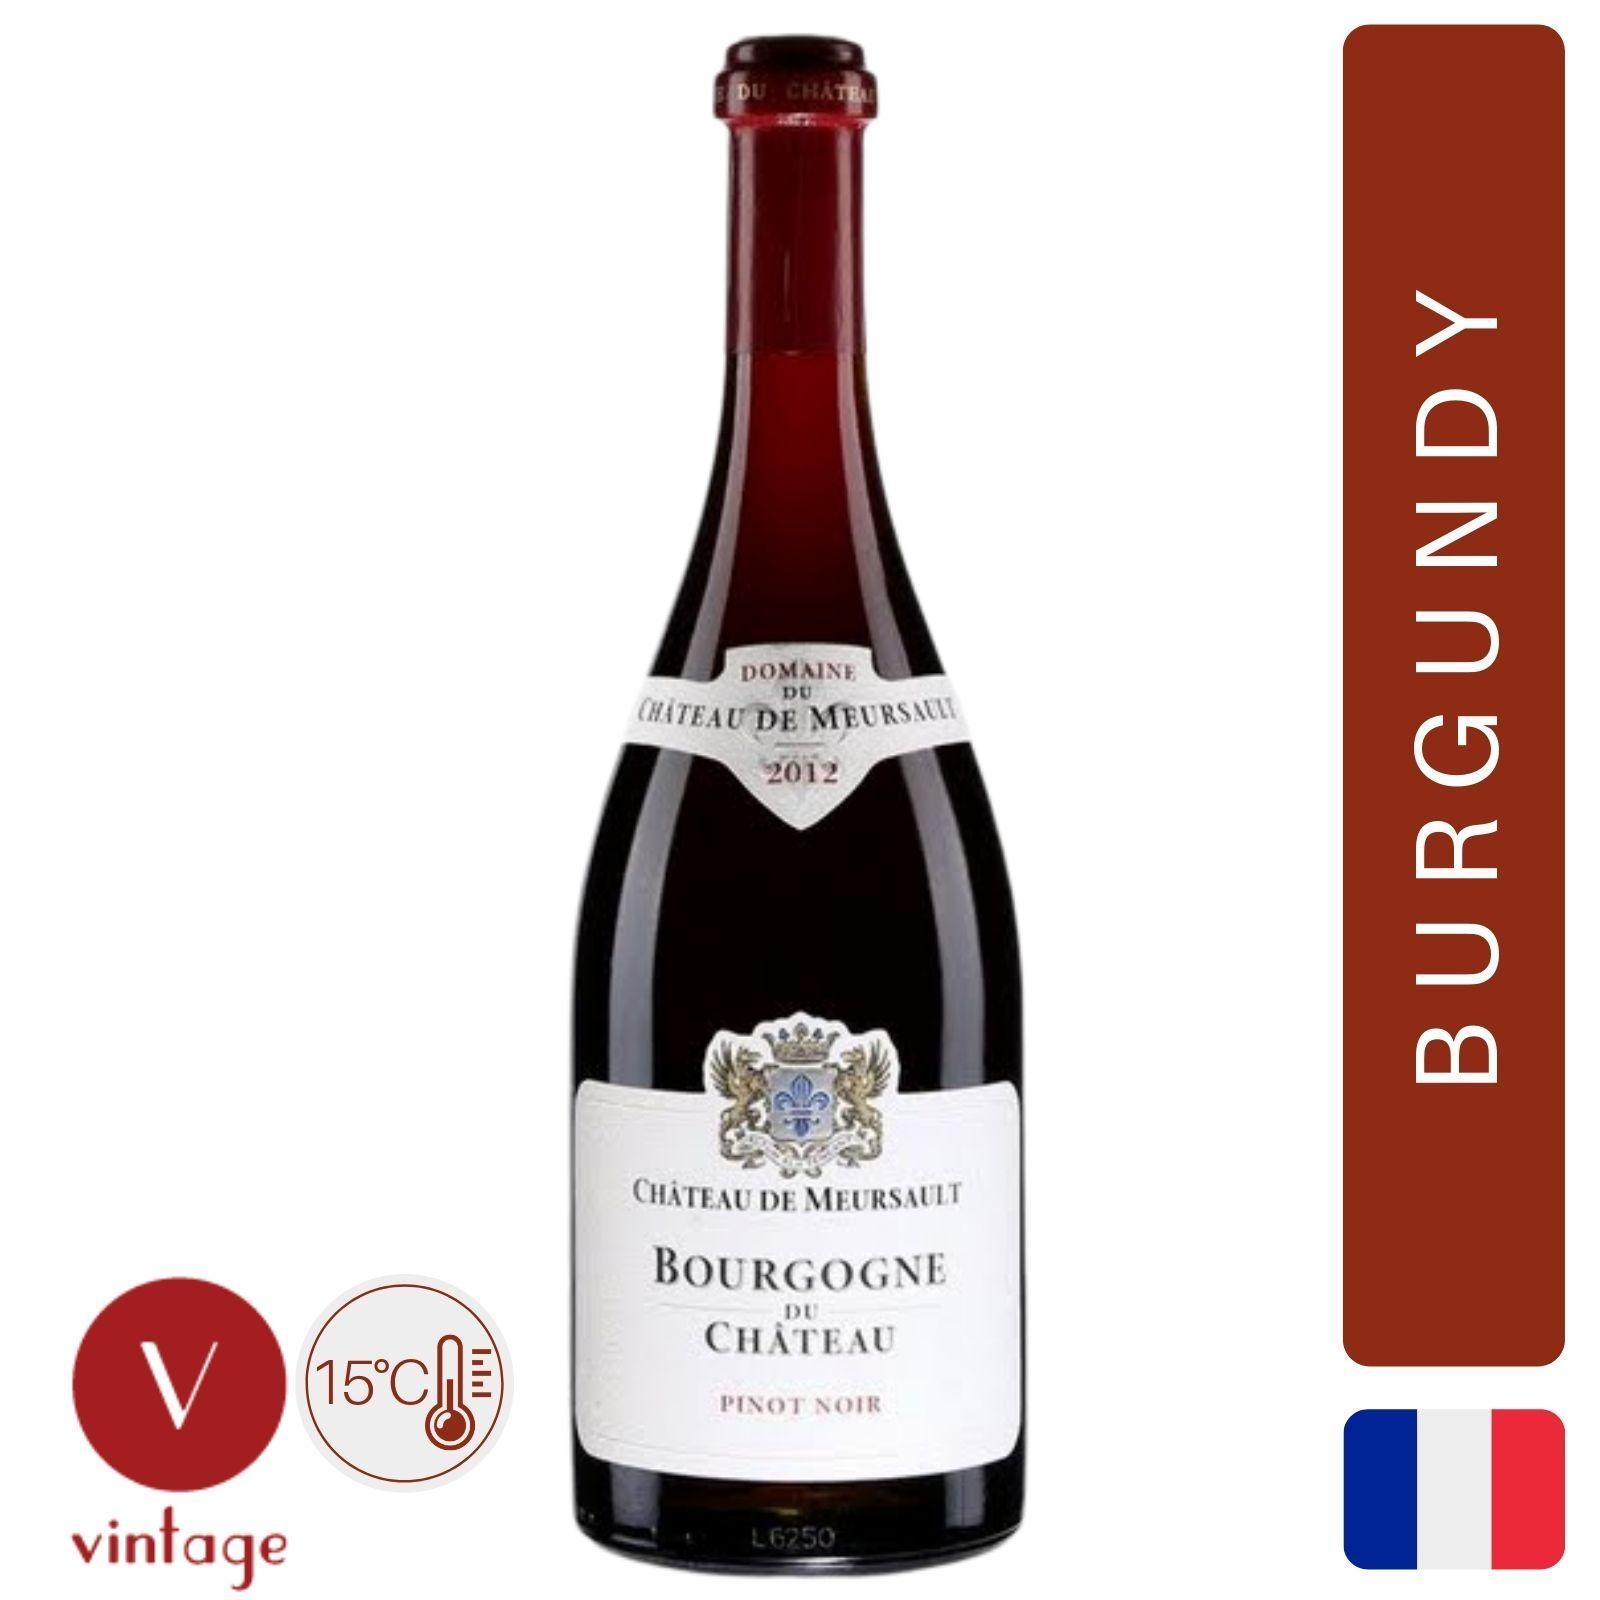 Chateau de Meursault - Pinot Noir - Burgundy Red Wine